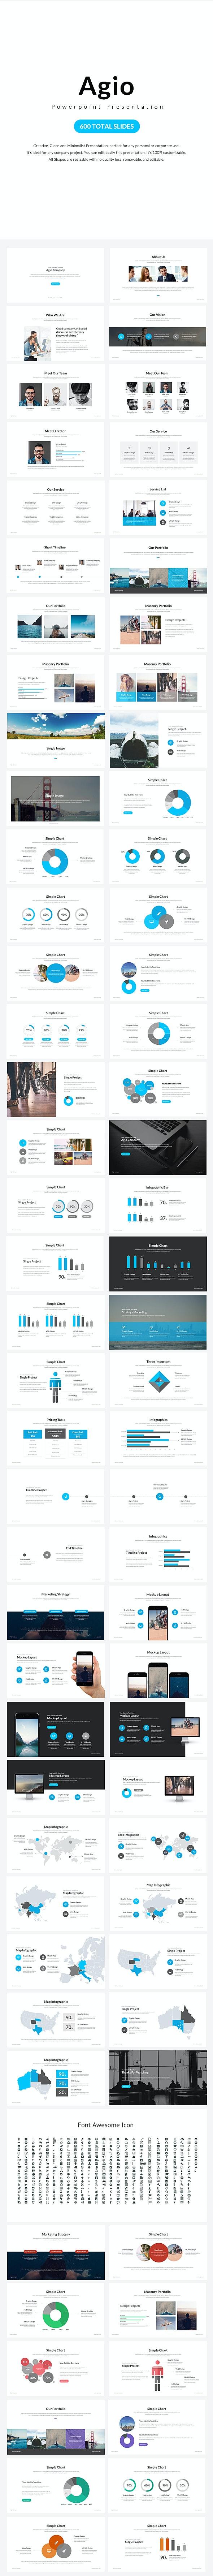 Agio Powerpoint Presentation - Business PowerPoint Templates